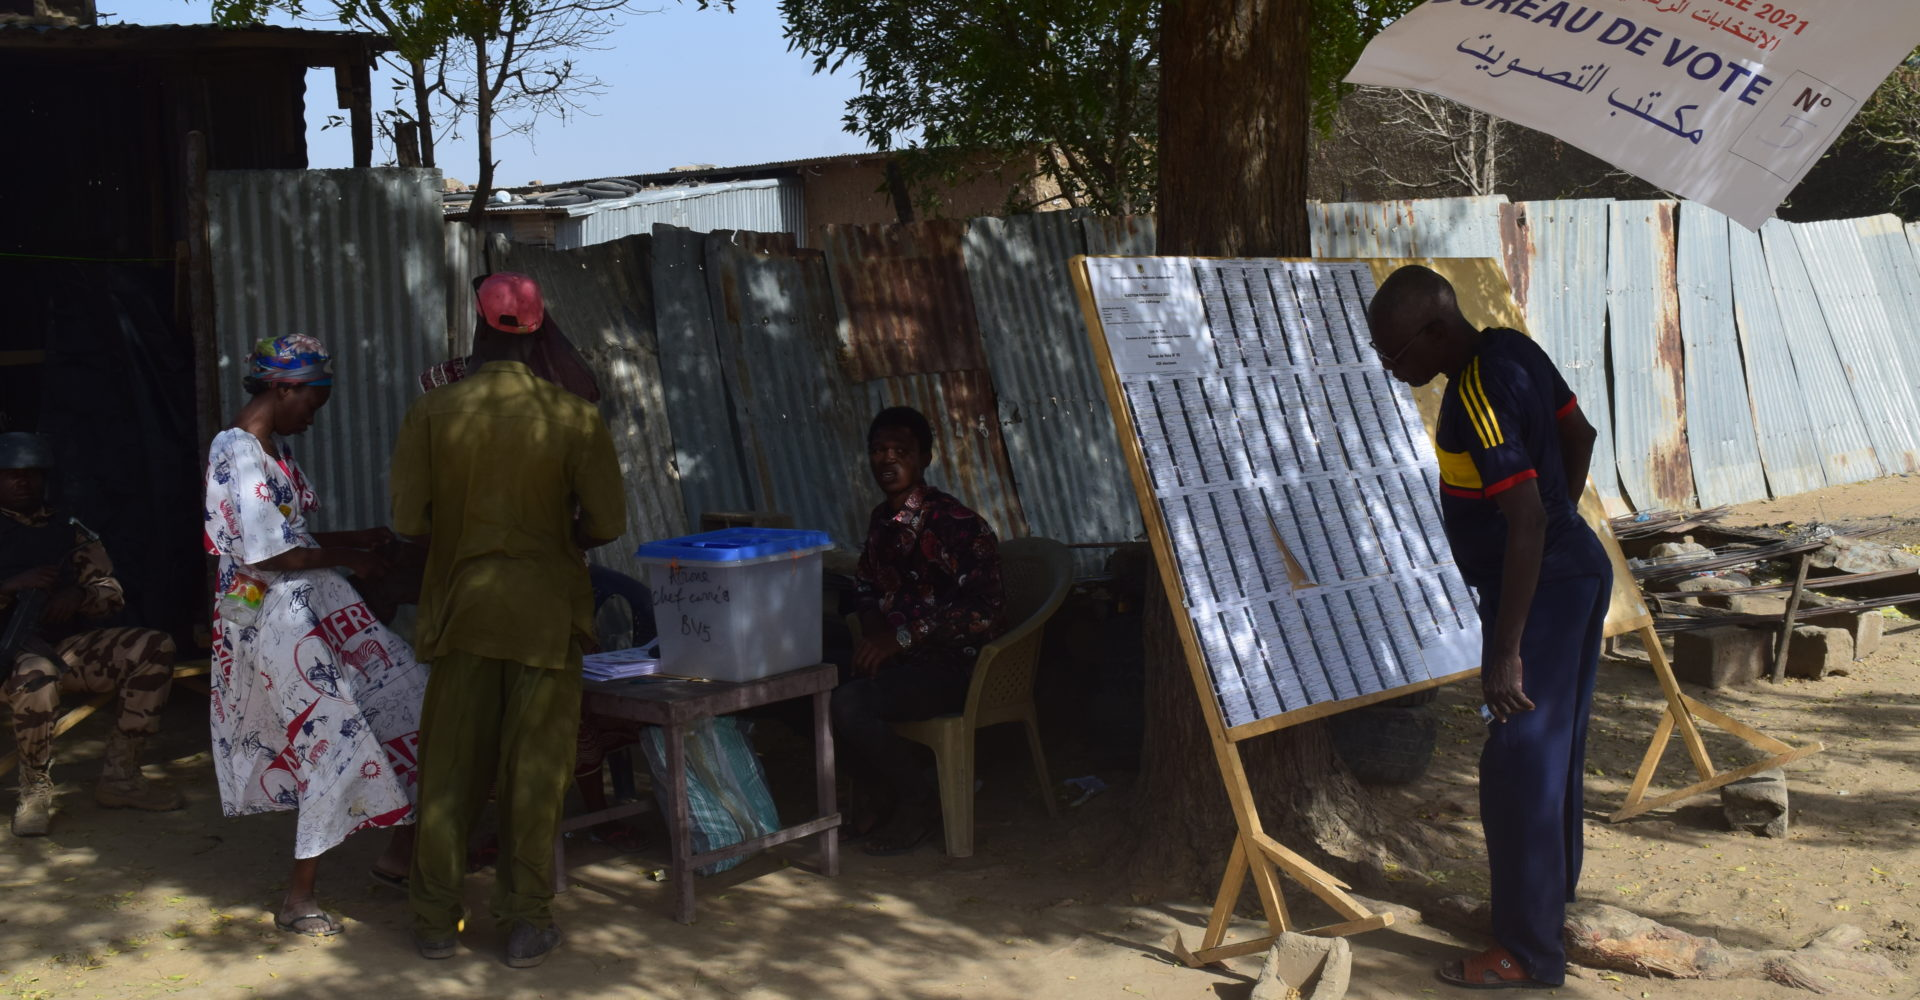 A N'Djamena, le boycott semble prendre le dessus 1